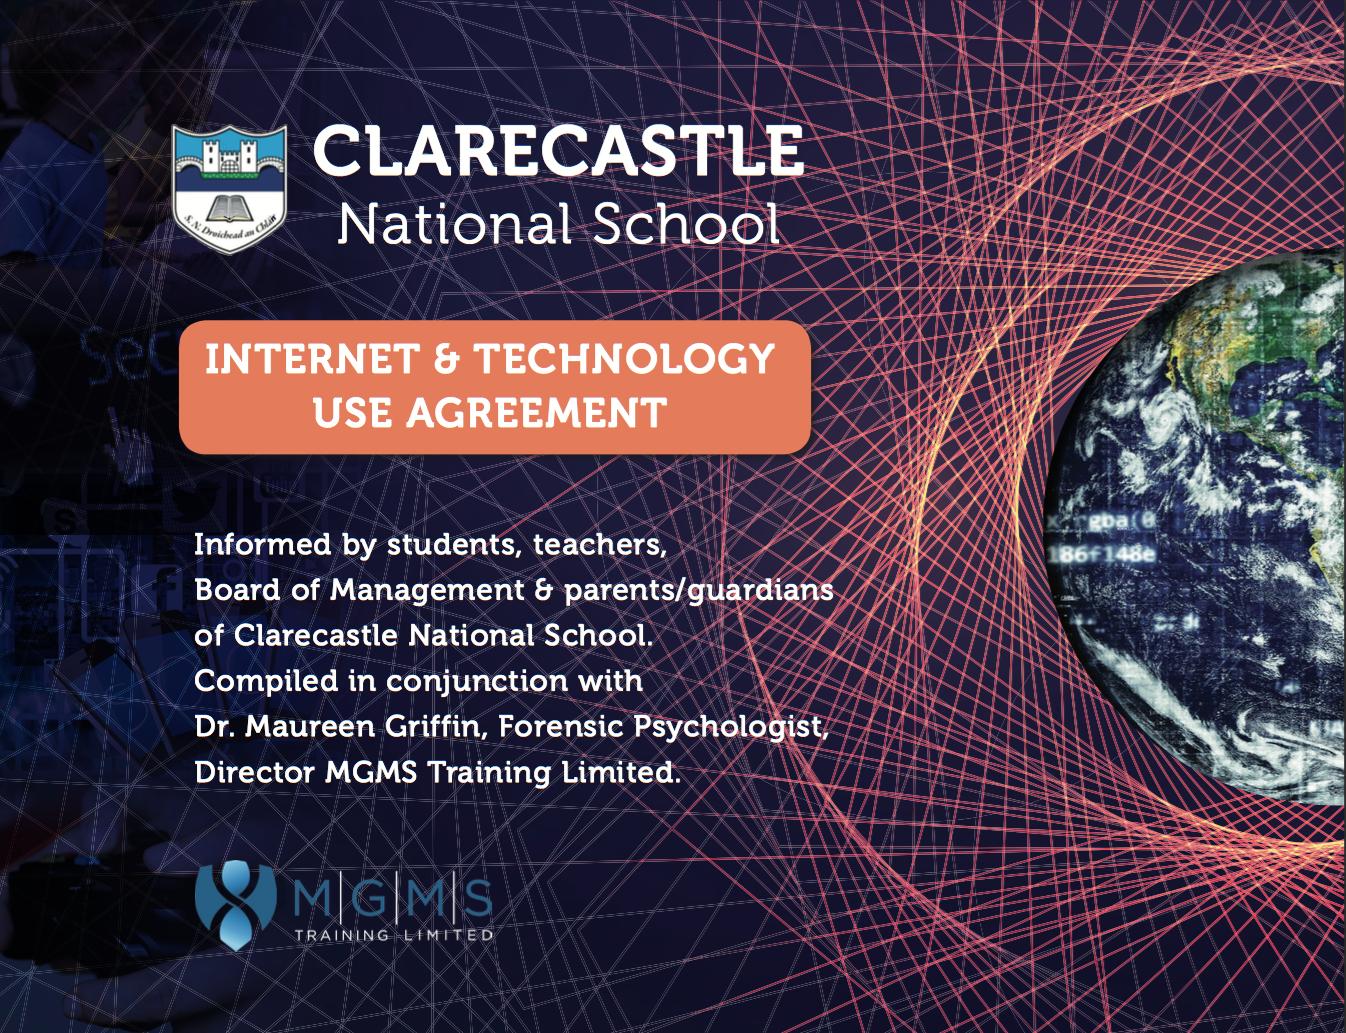 www.mgmstraining.ie/clarecastlenationalschoolagreement